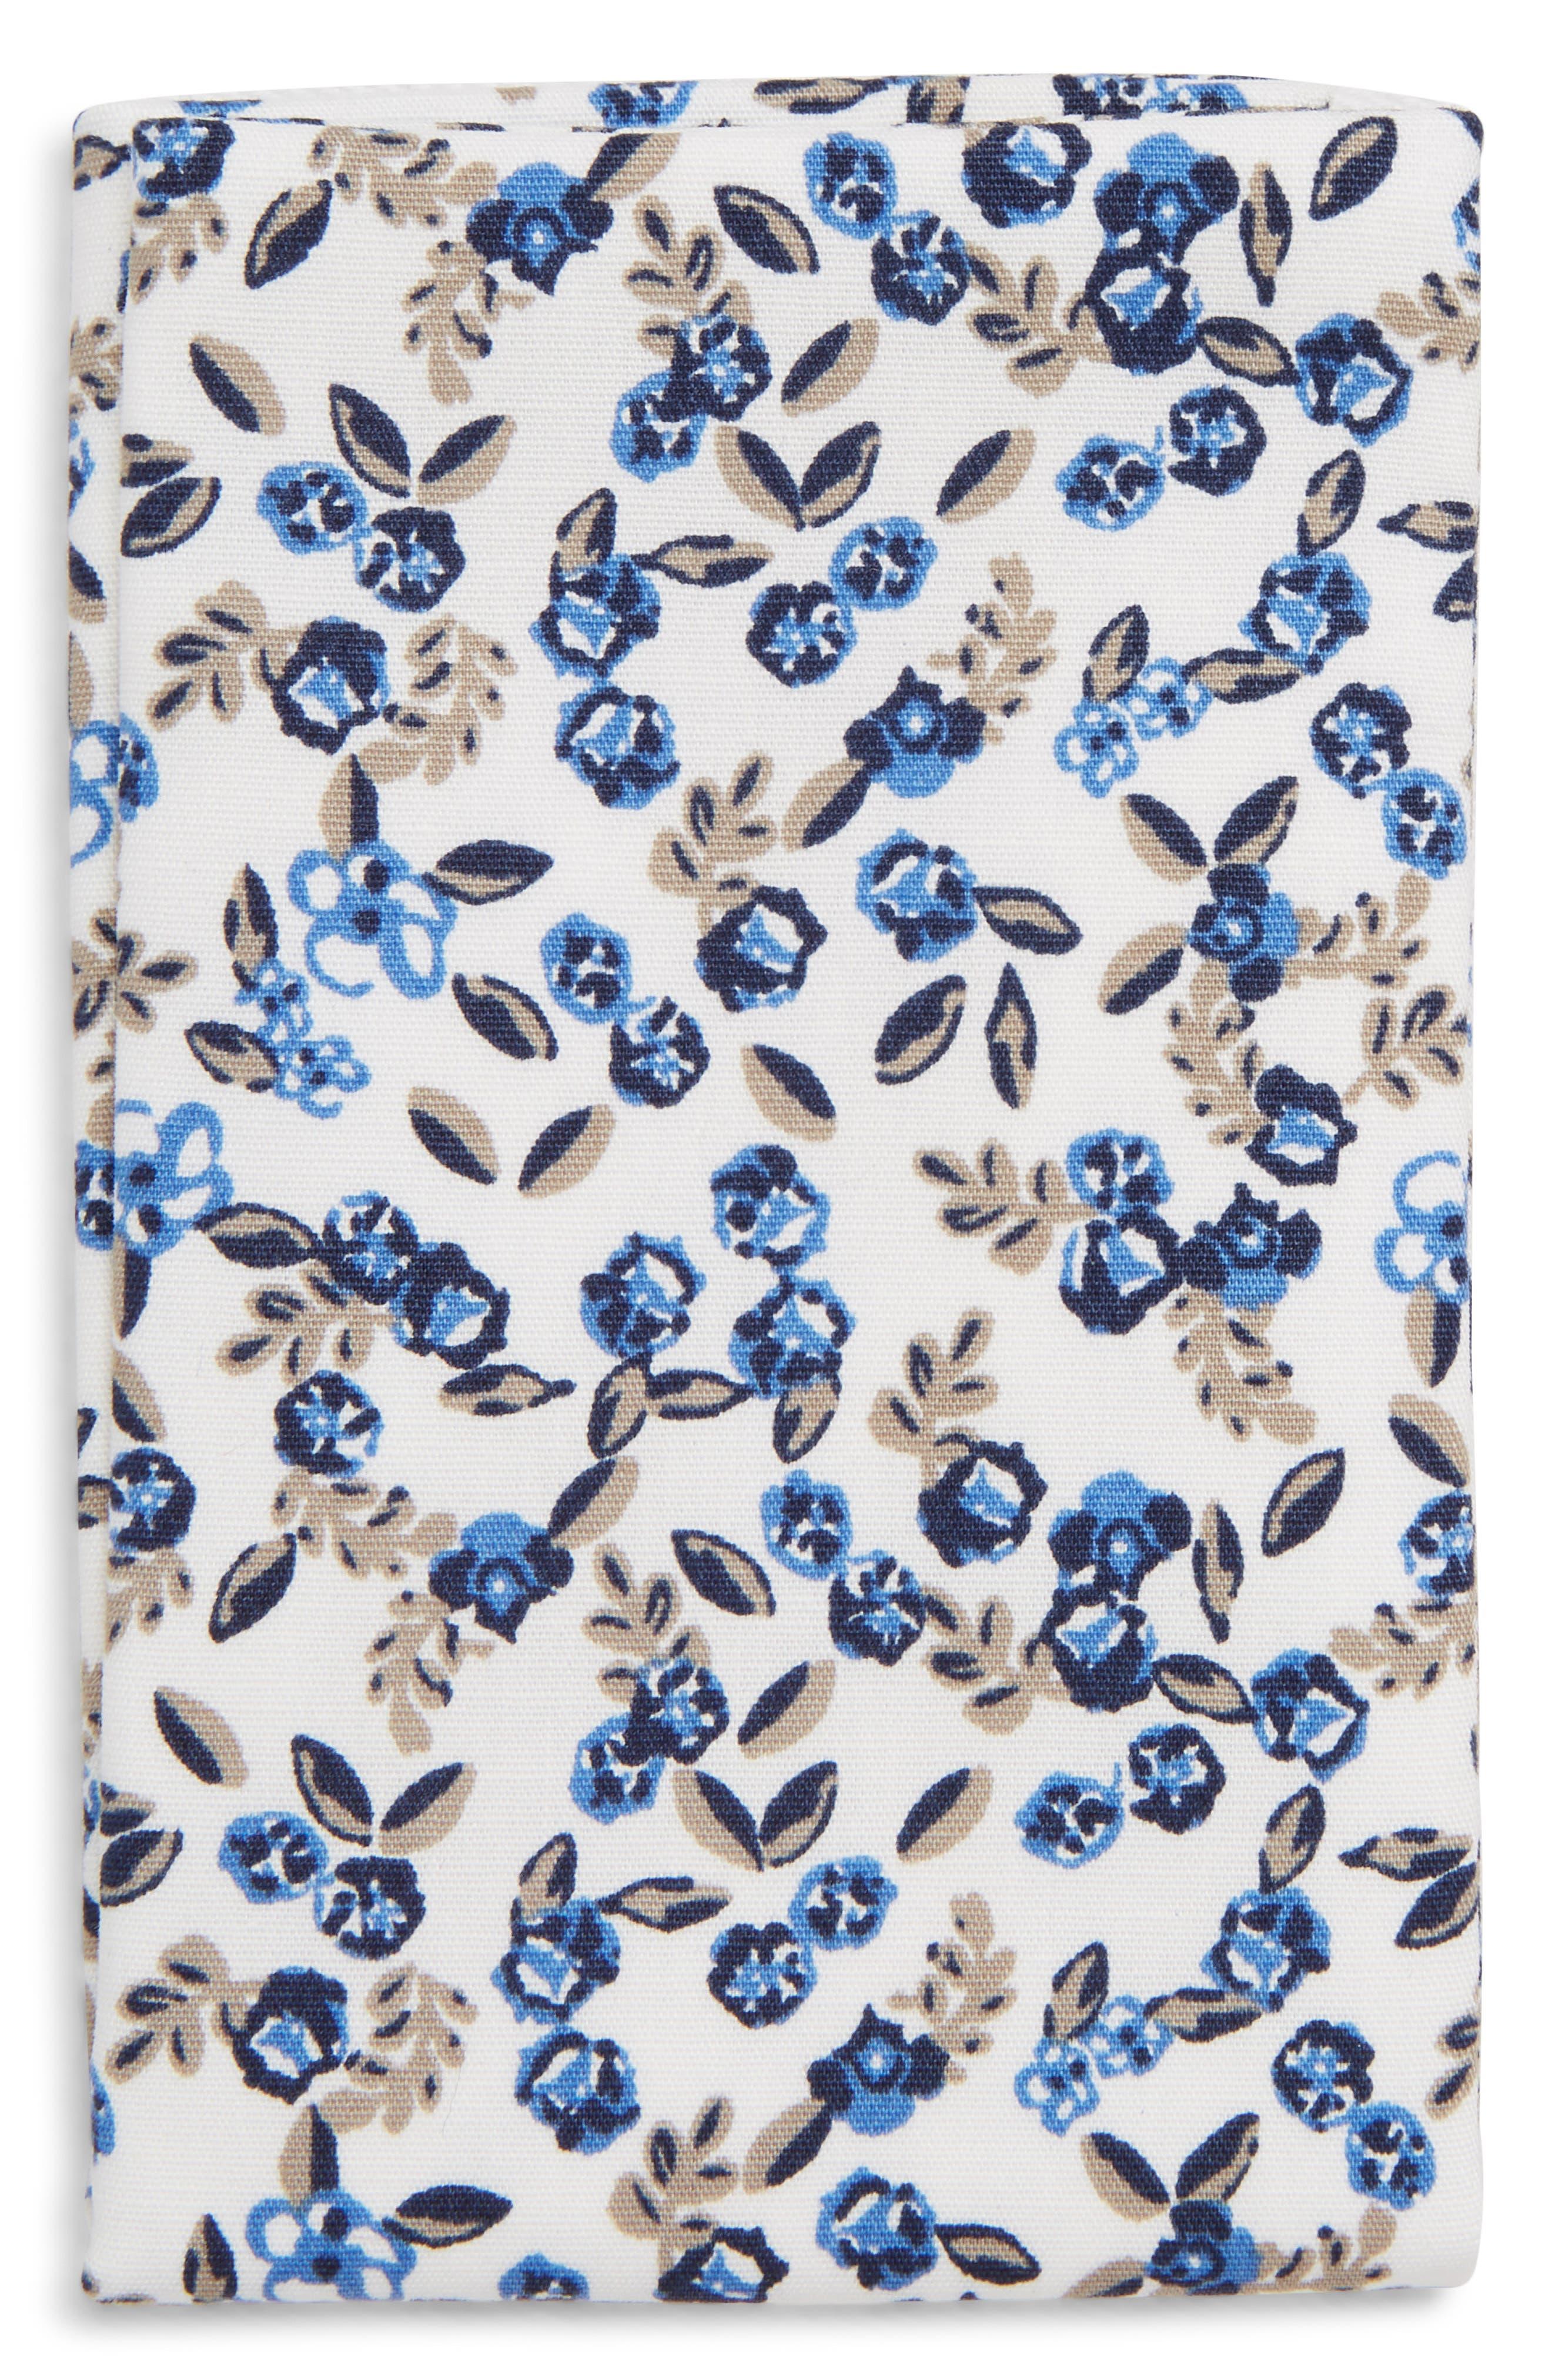 Floral Pocket Square,                             Alternate thumbnail 2, color,                             100